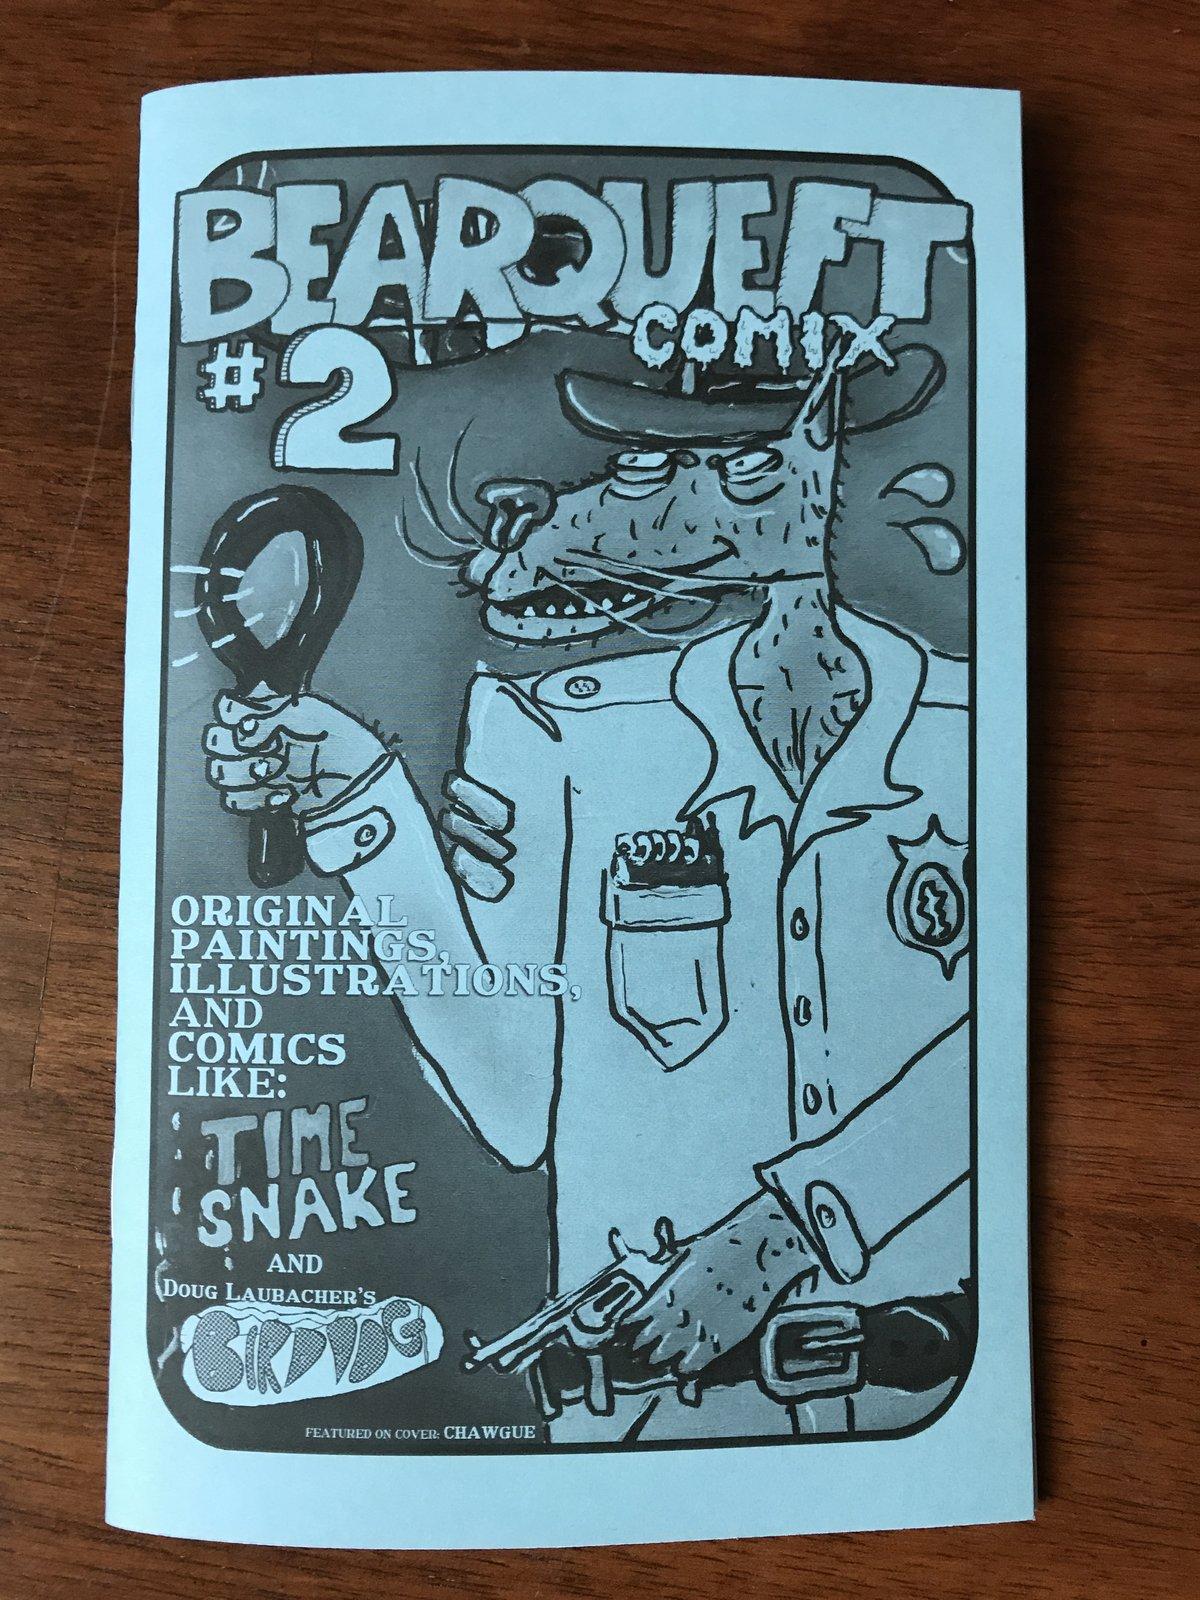 Image of Bearqueft Comix #2 - Zine